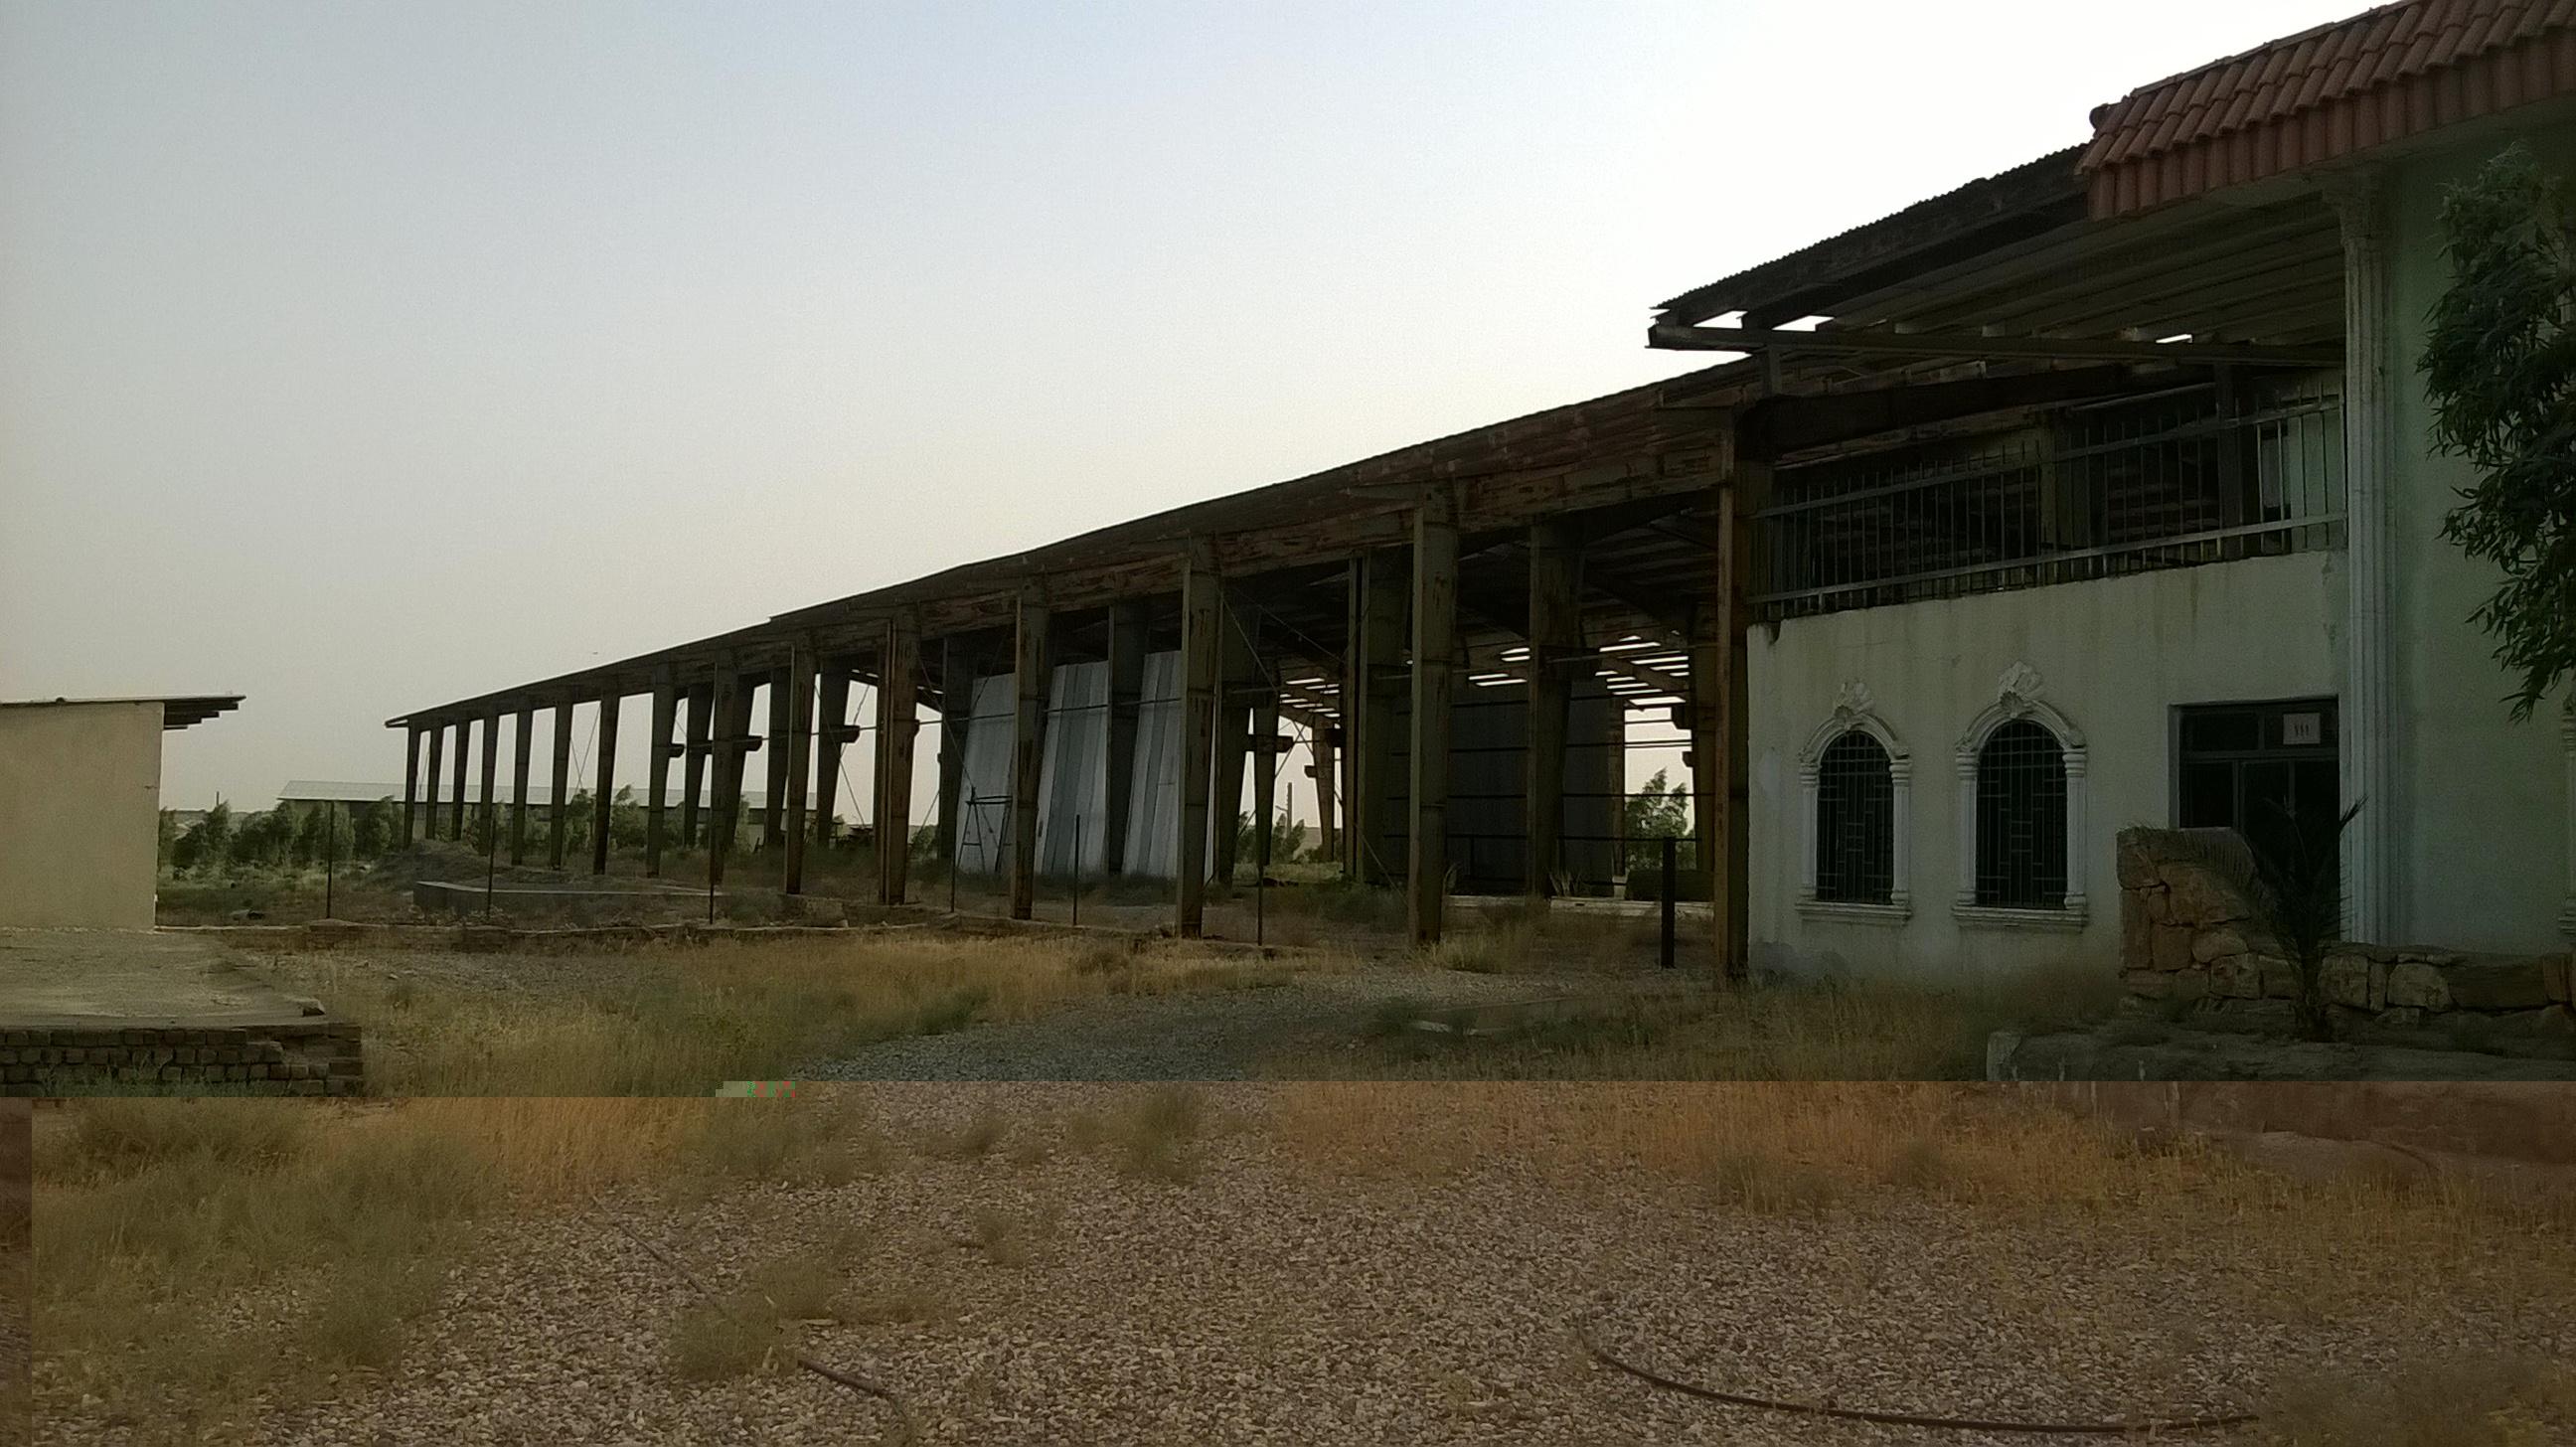 فروش کارخانه بزرگ نورد فولاد